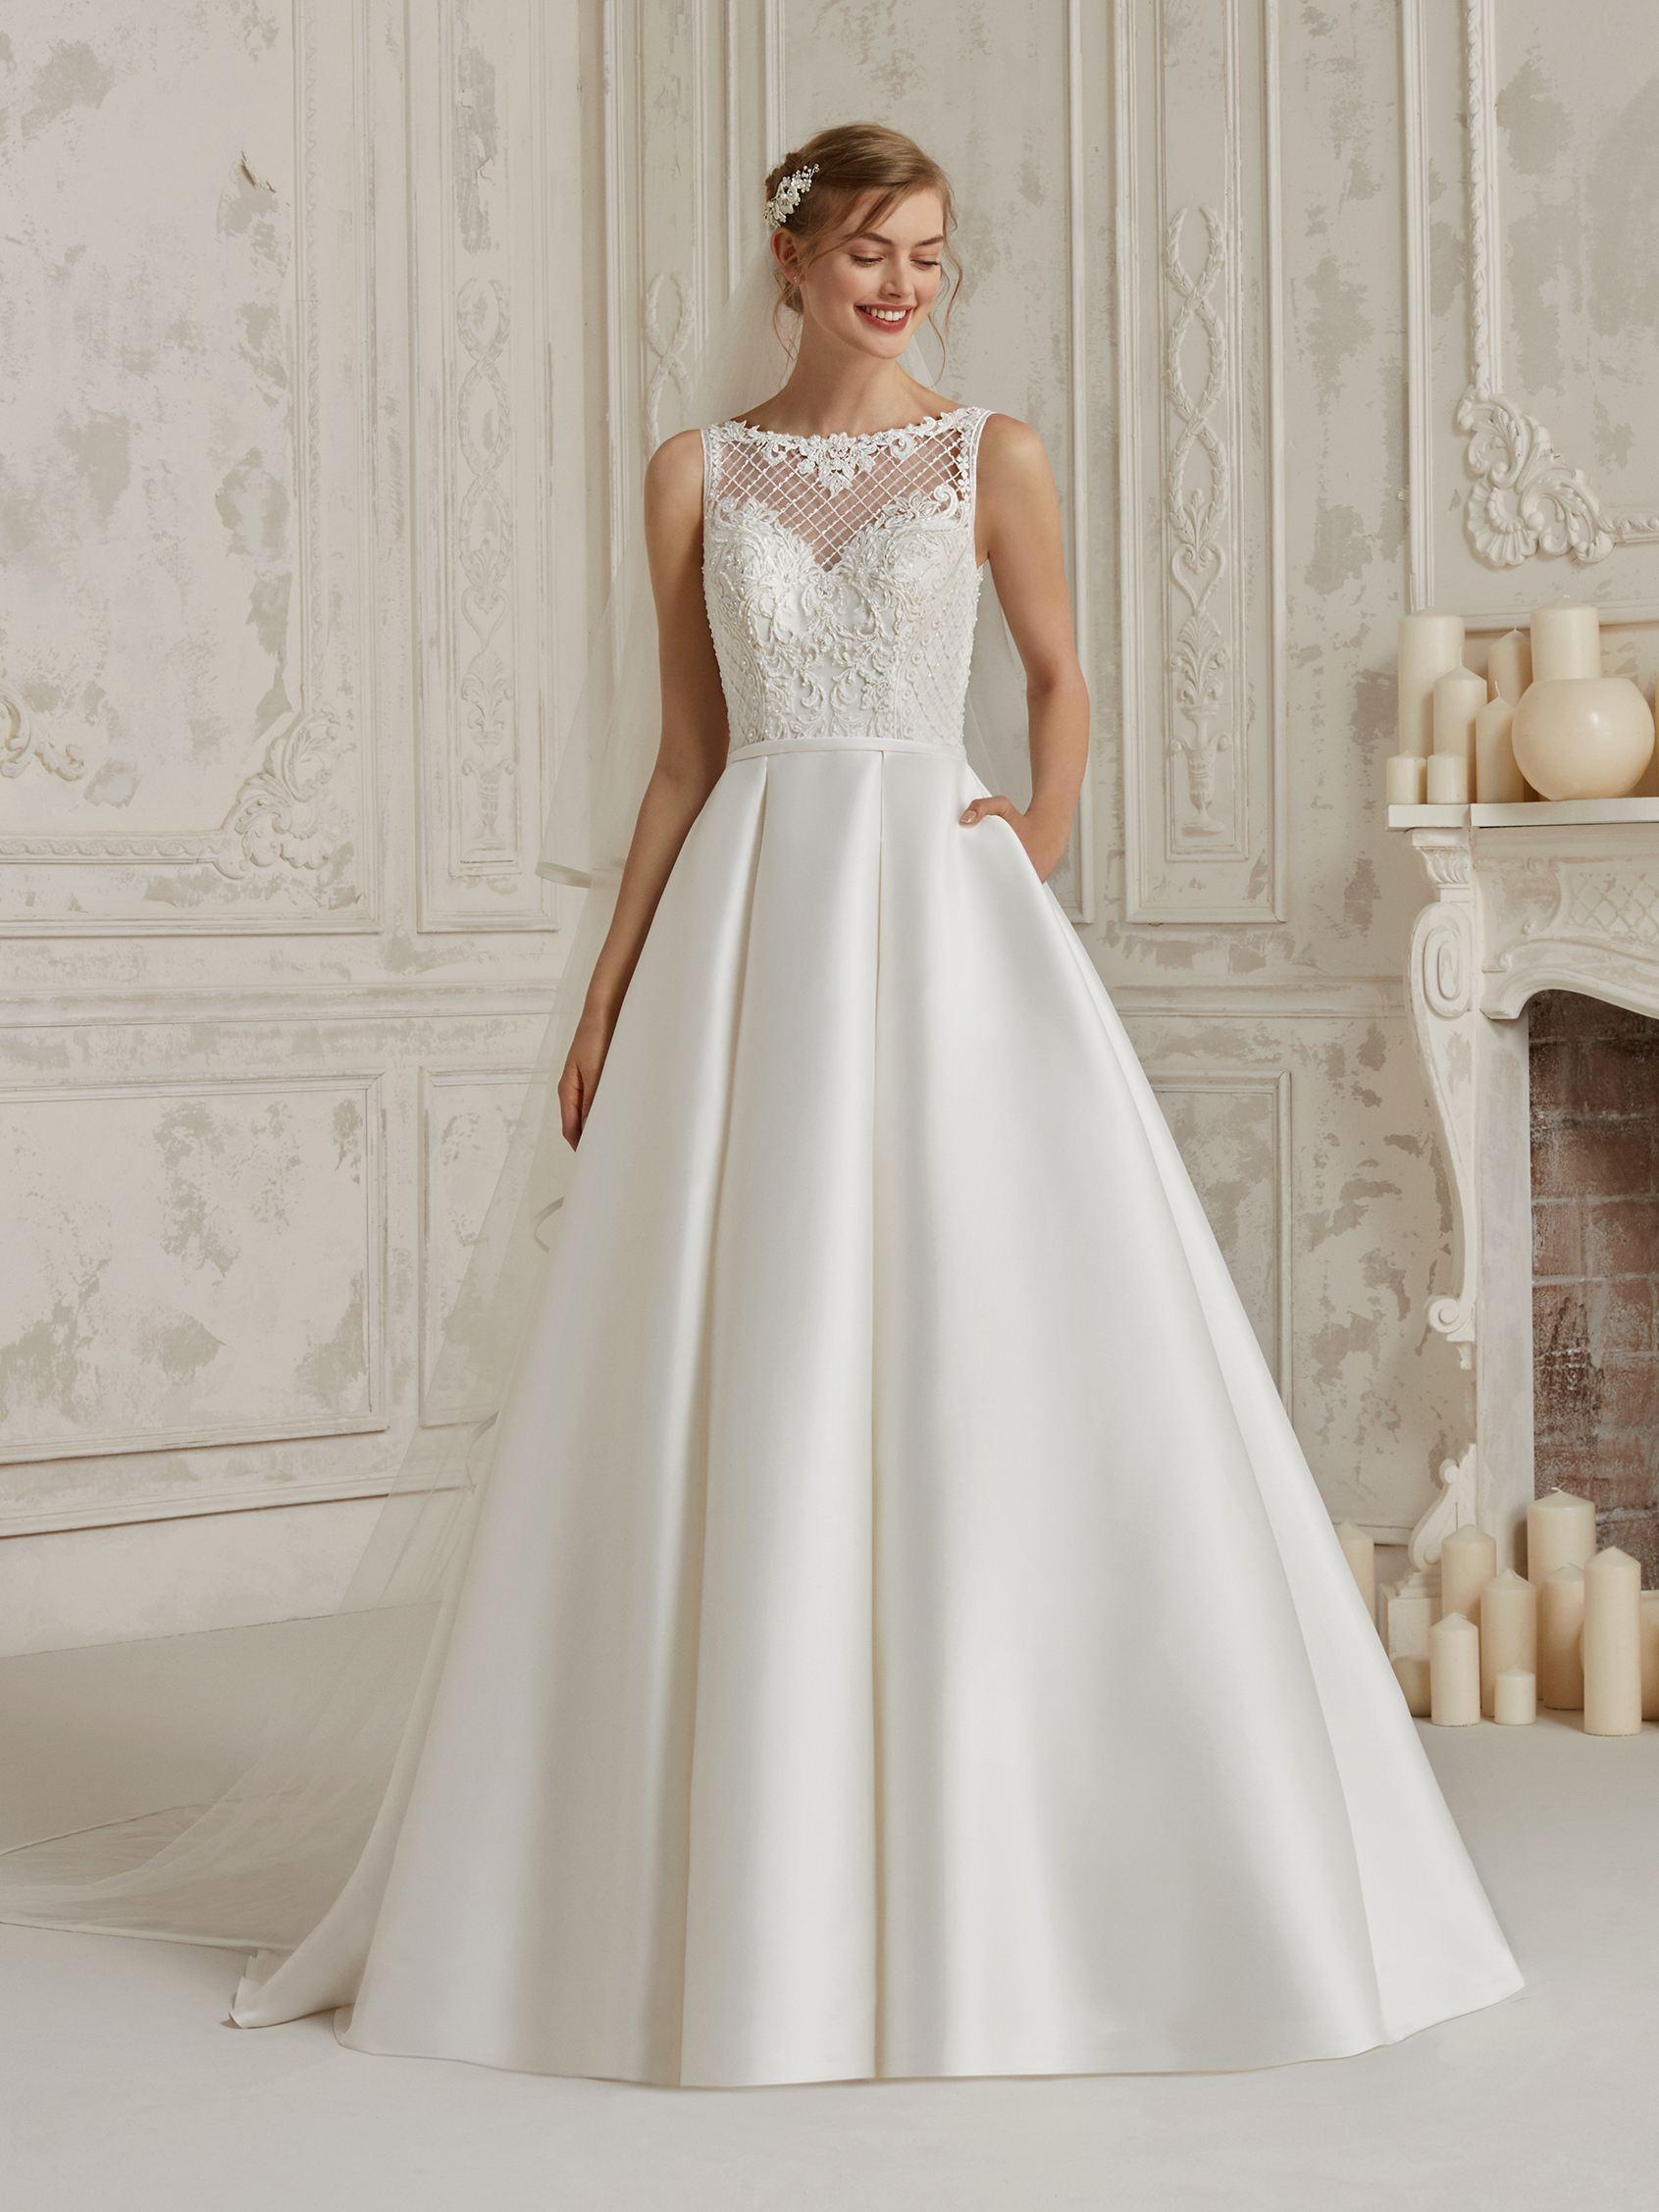 Wedding Dresses Glasgow Ivory Pinks Bridal Boutique